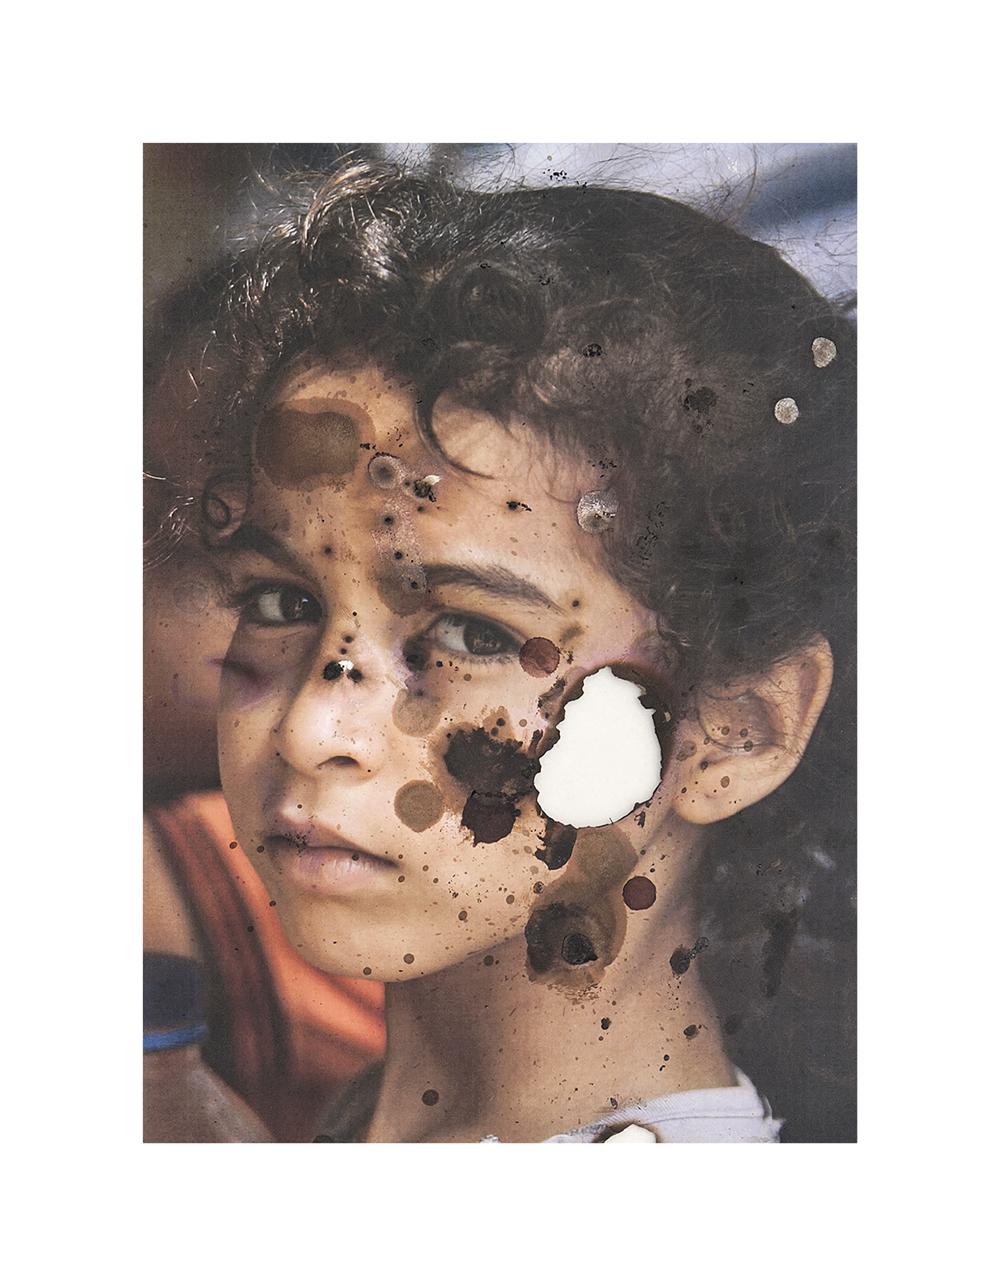 Palestinian girl watching the world